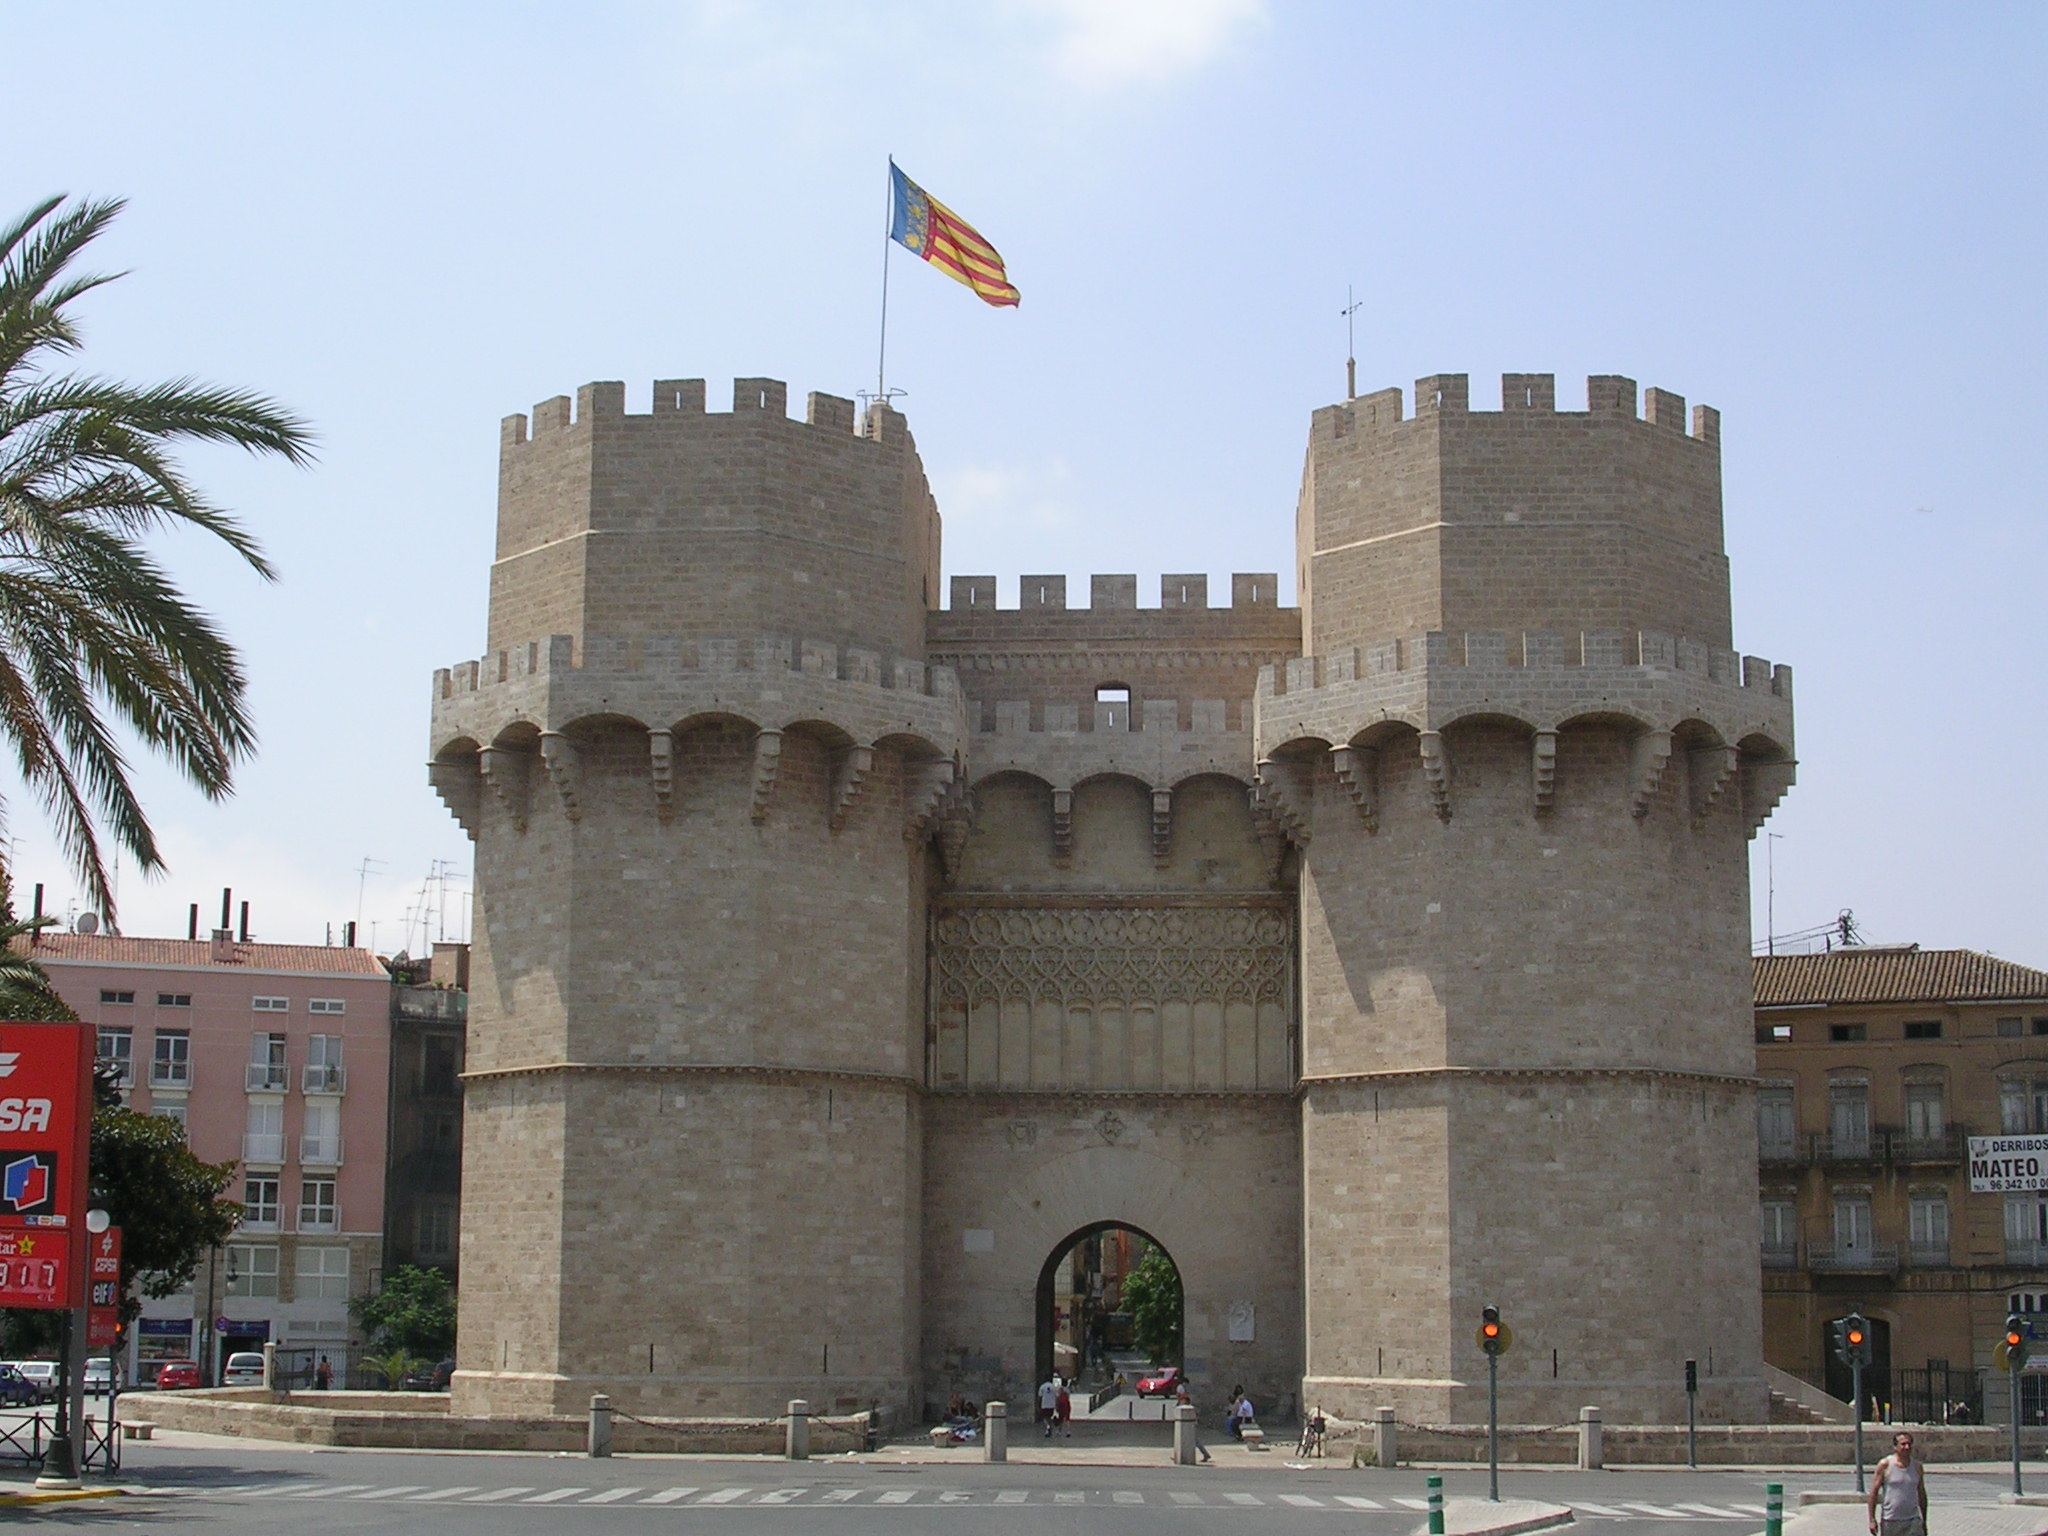 torres_de_serranos_28valencia29